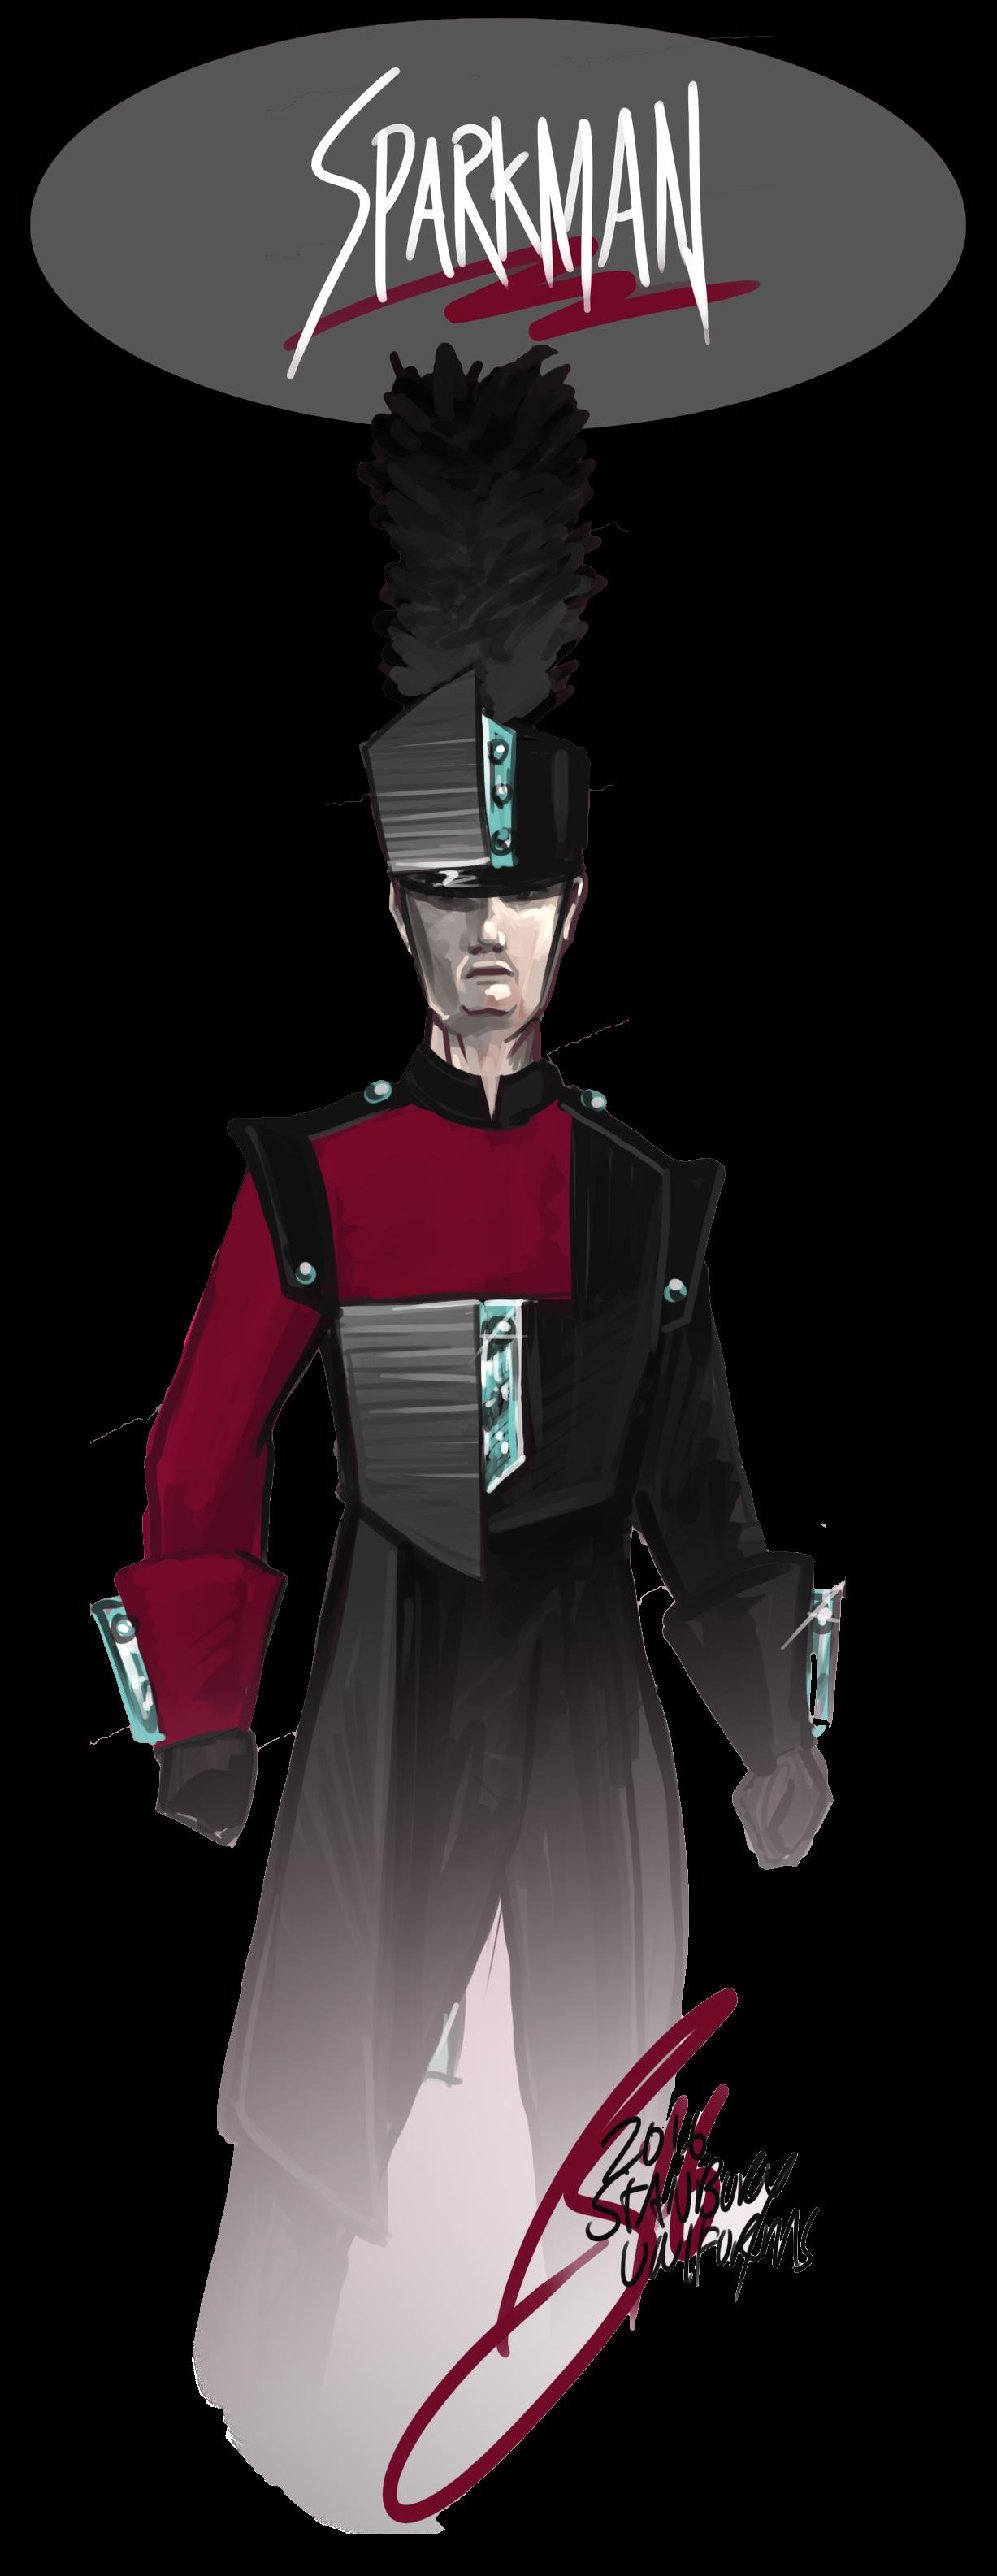 What is the uniform procedure?